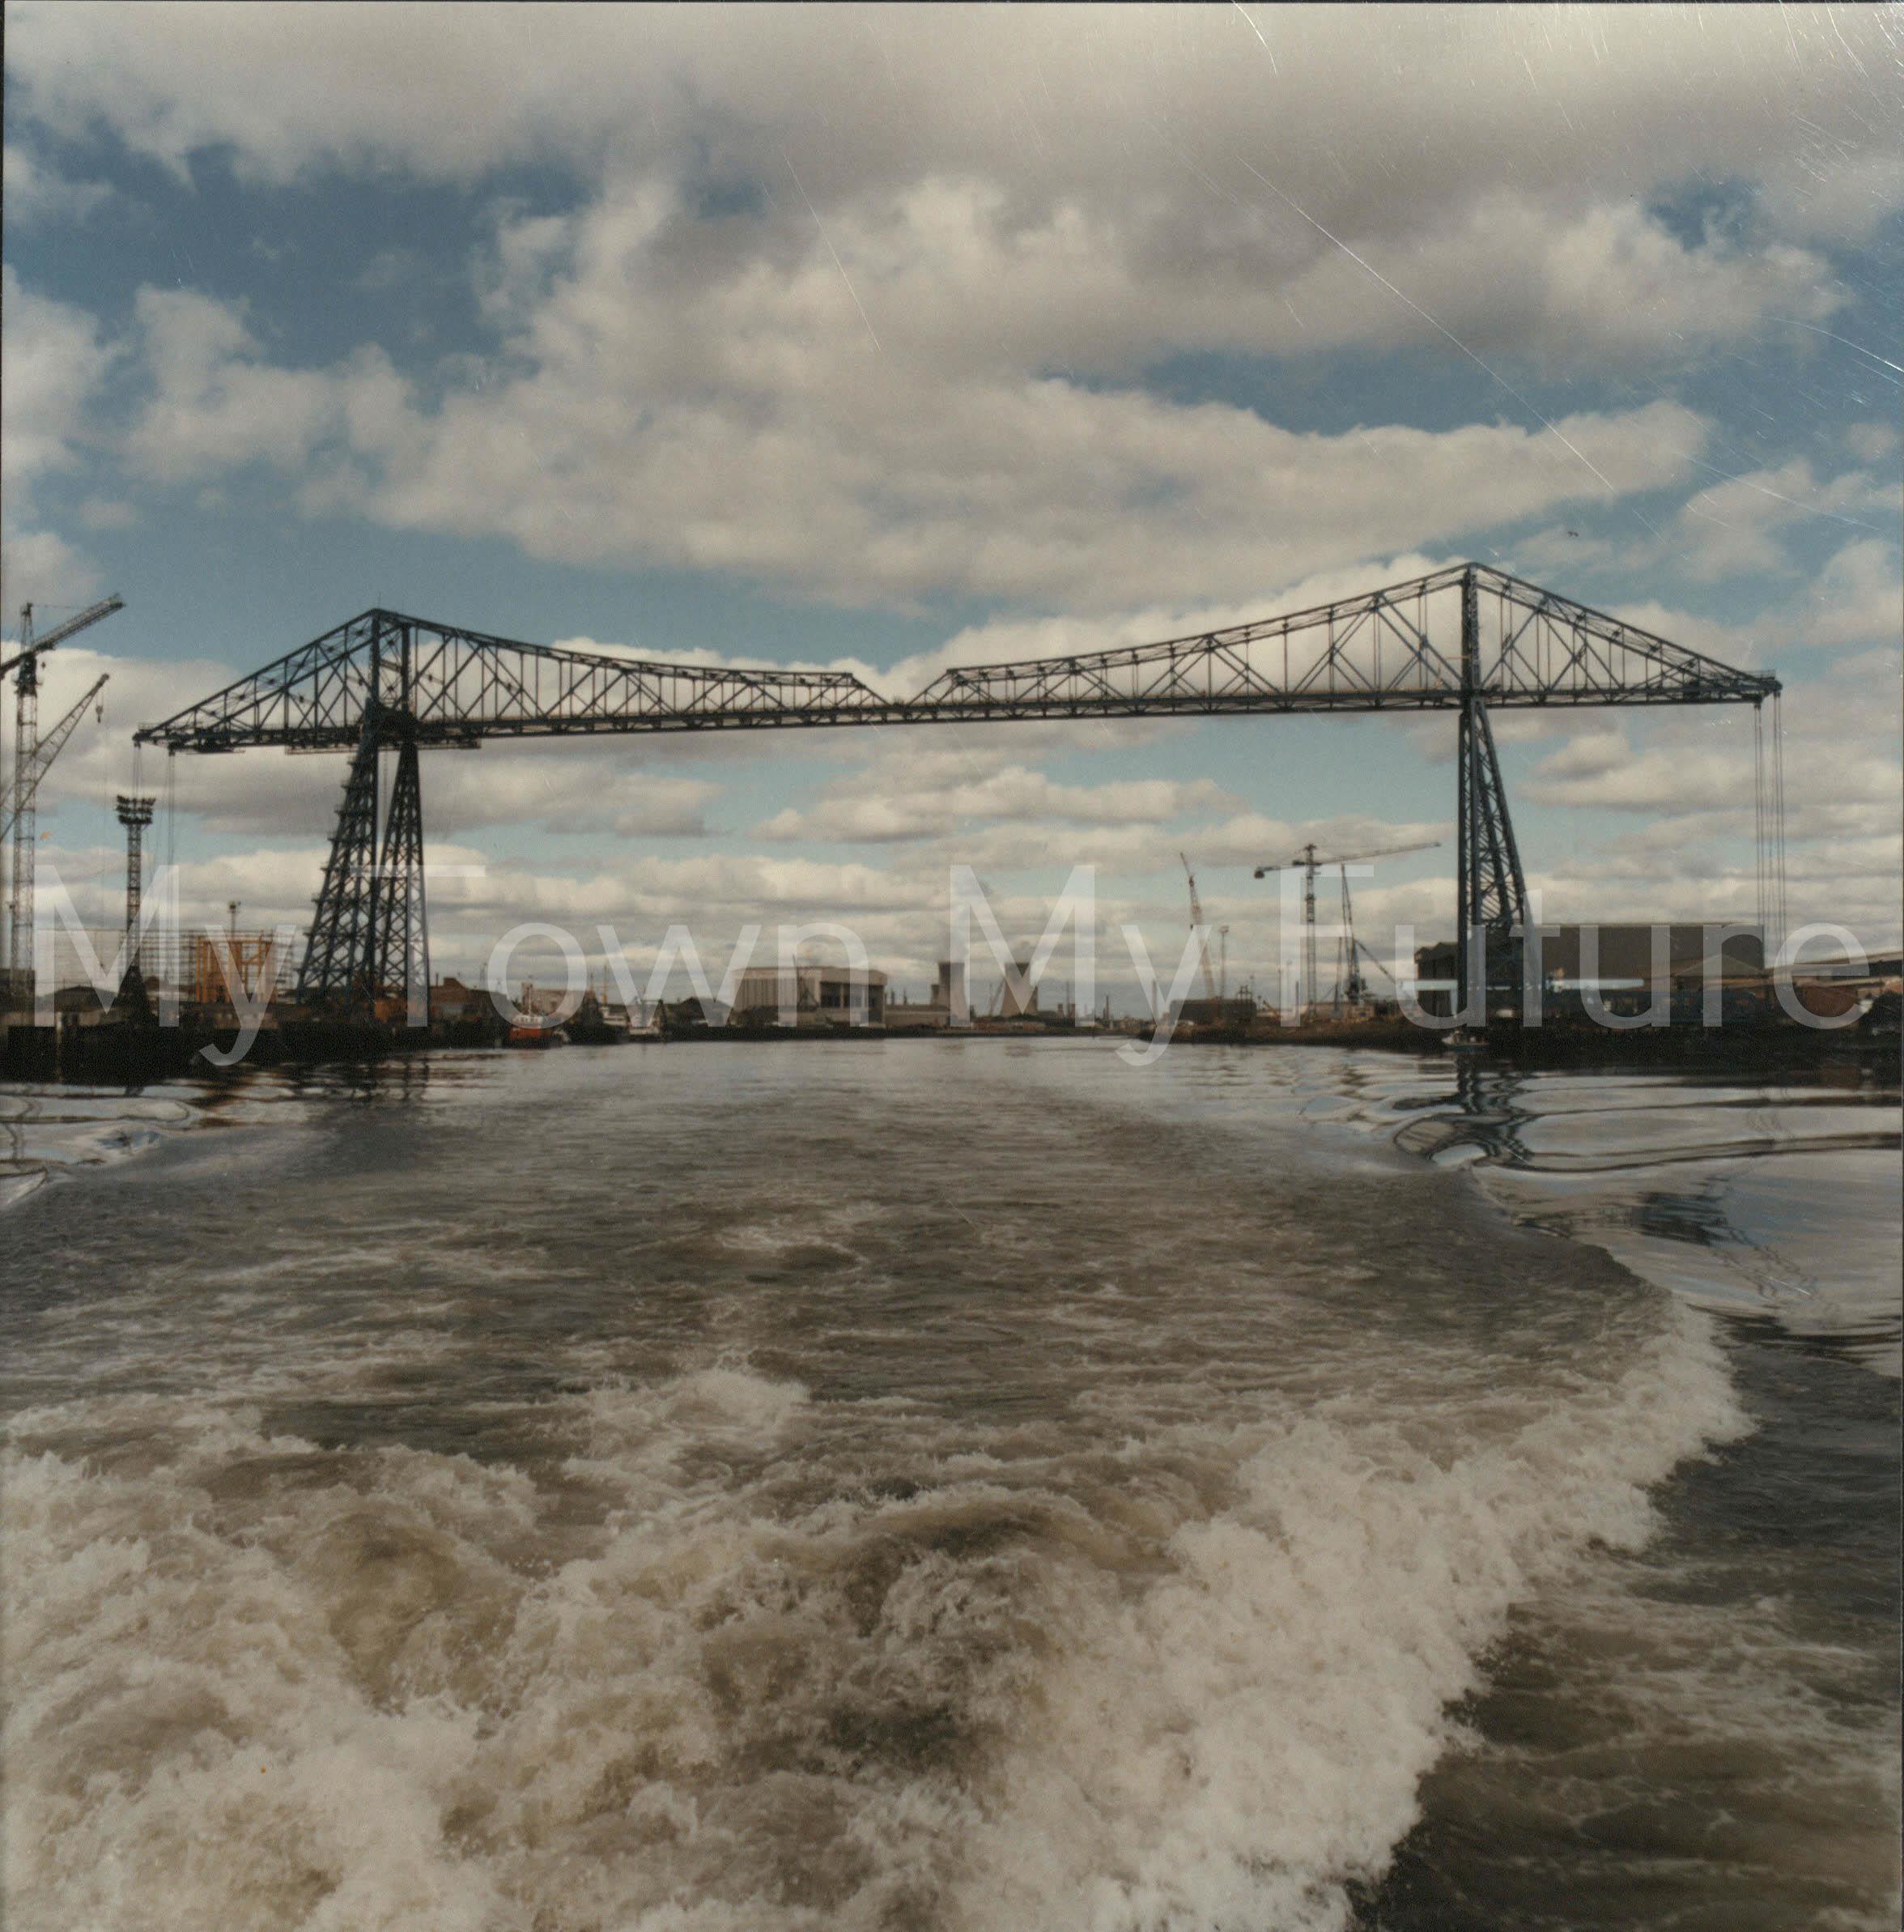 Transporter Bridge, 16th August 1988, Department of Ec. Development & Planning - Cleveland County Council